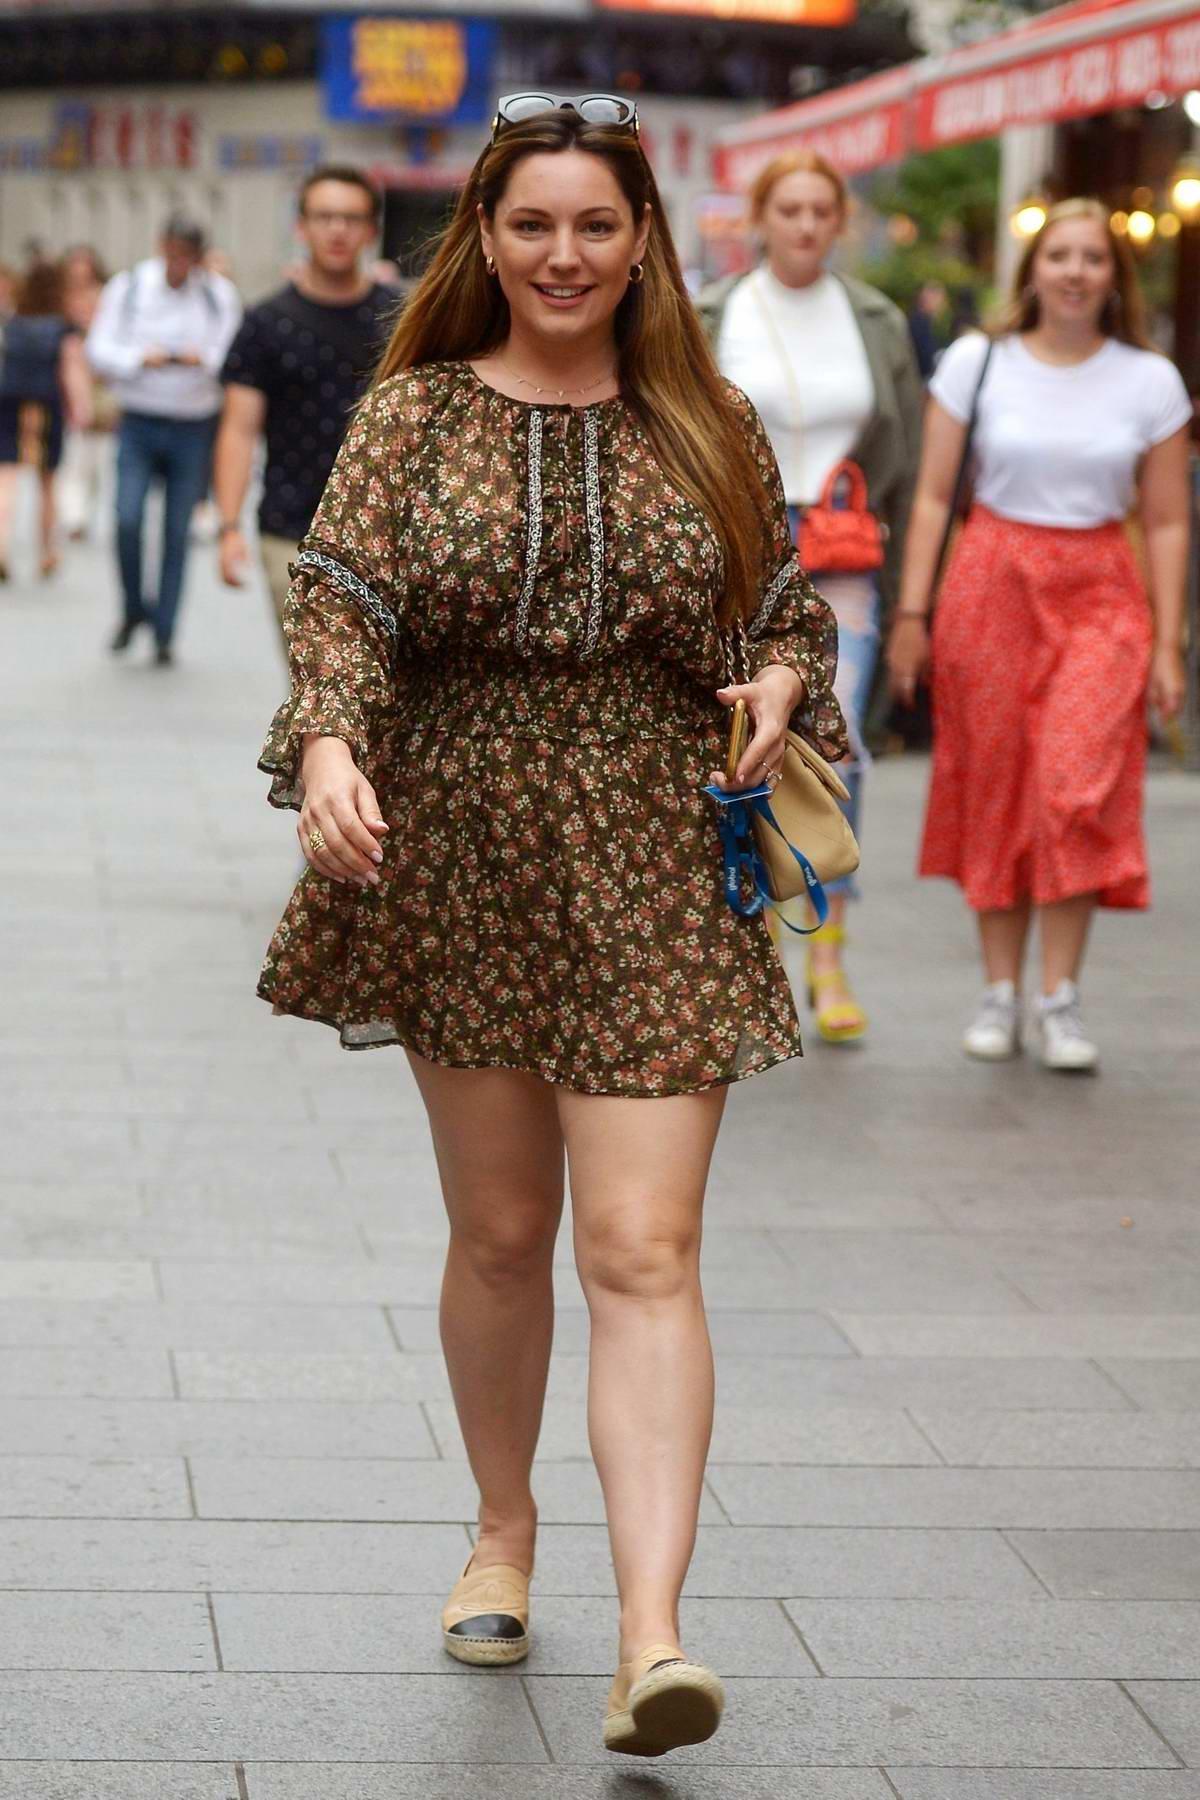 Kelly Brook looks pretty in a summer dress as she leaves Global Radio Studios in London, UK